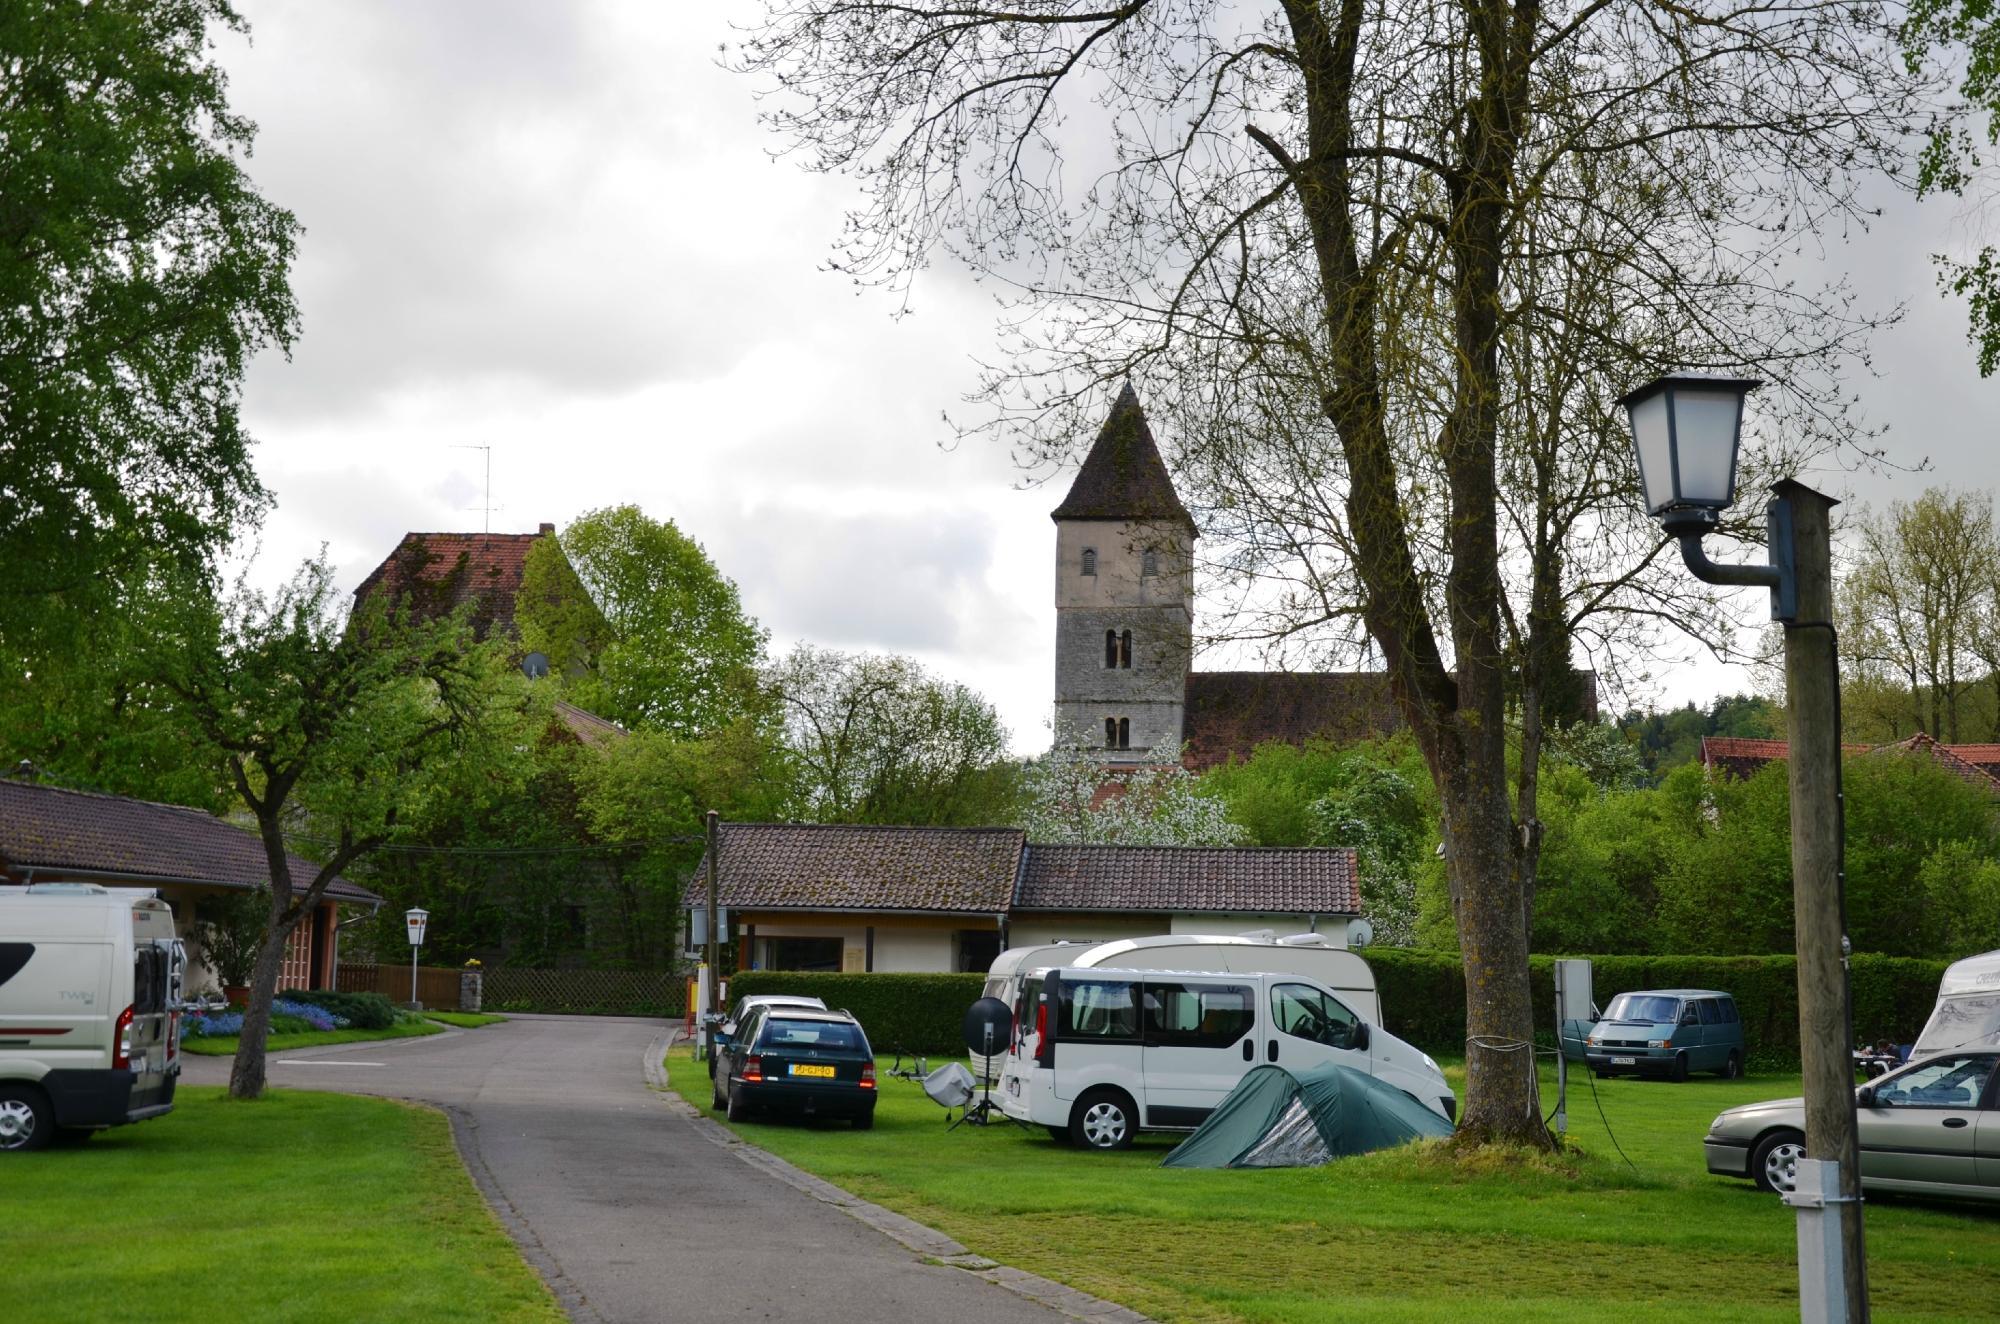 Camping Tauber-Idyll